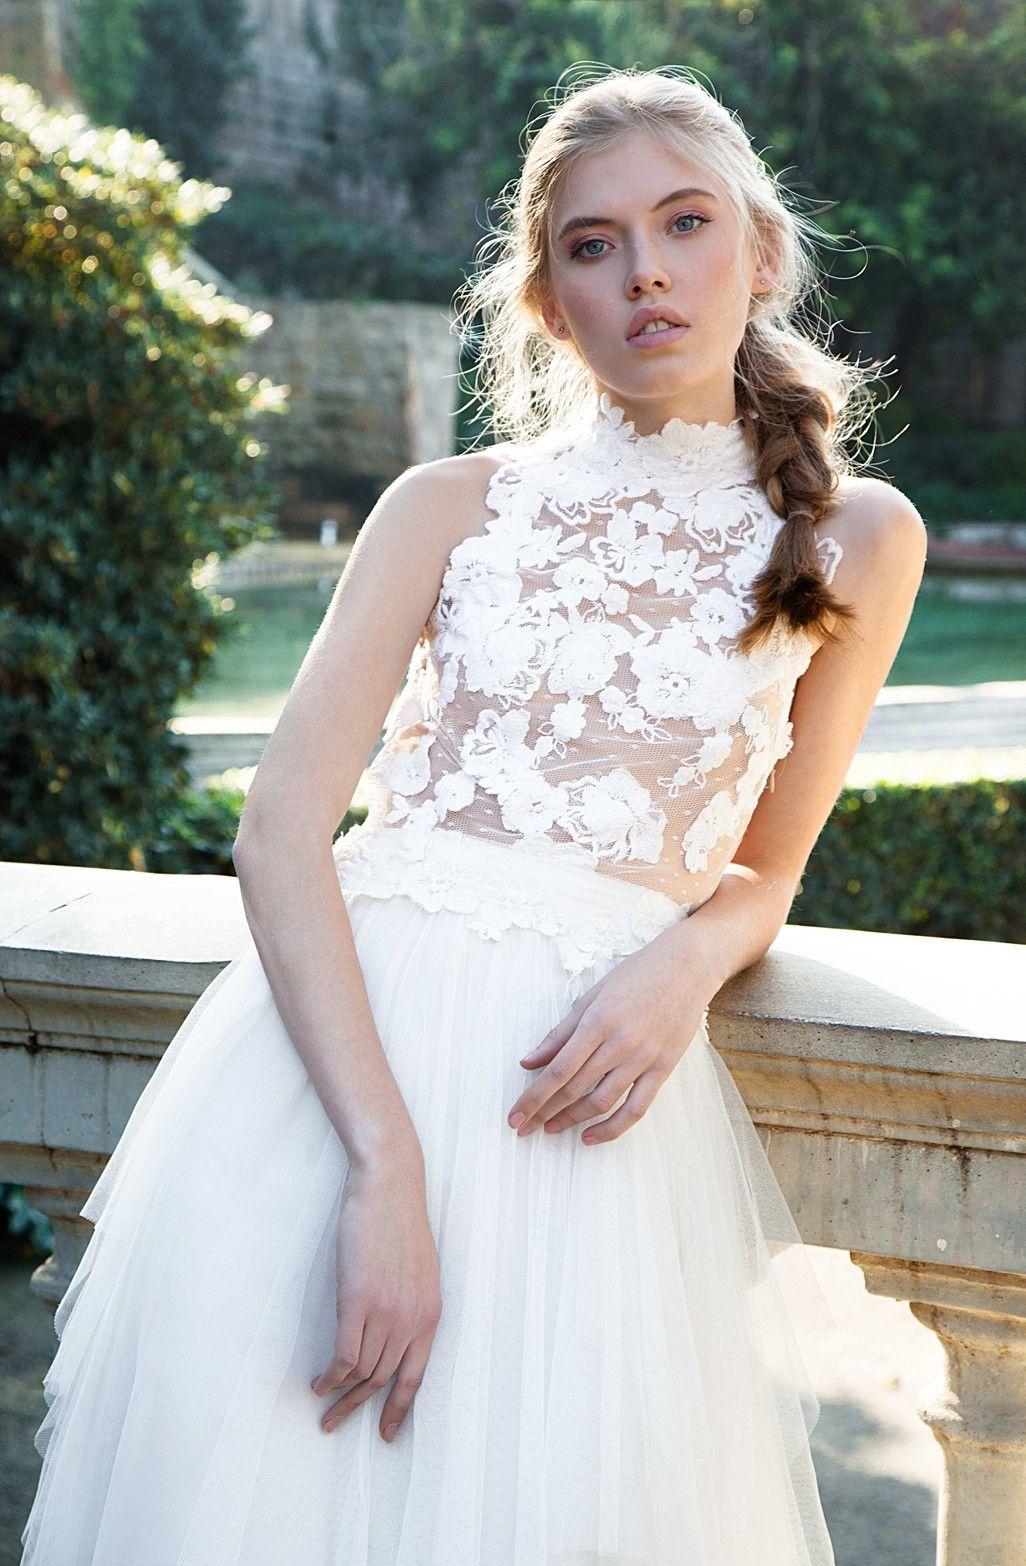 modelo biuse vestidos de novia 2 piezas blonda encaje sin espalda boho chic  escote halter slow wedding